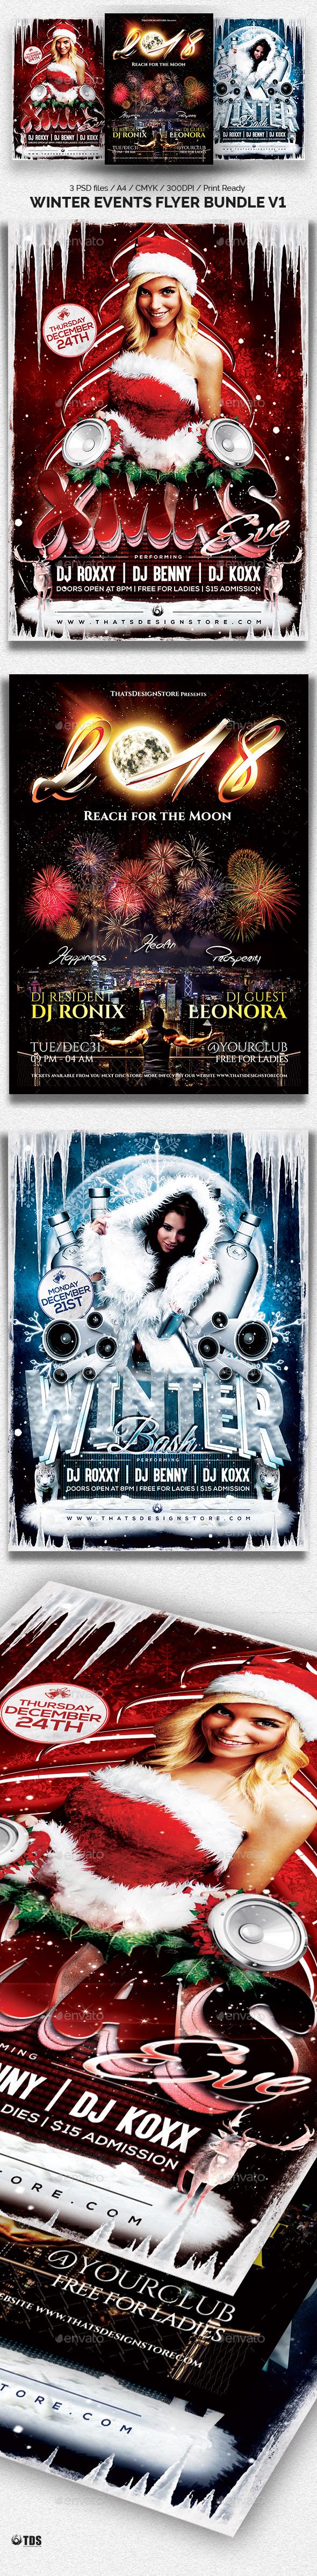 Winter Events Flyer Bundle - Clubs & Parties Events